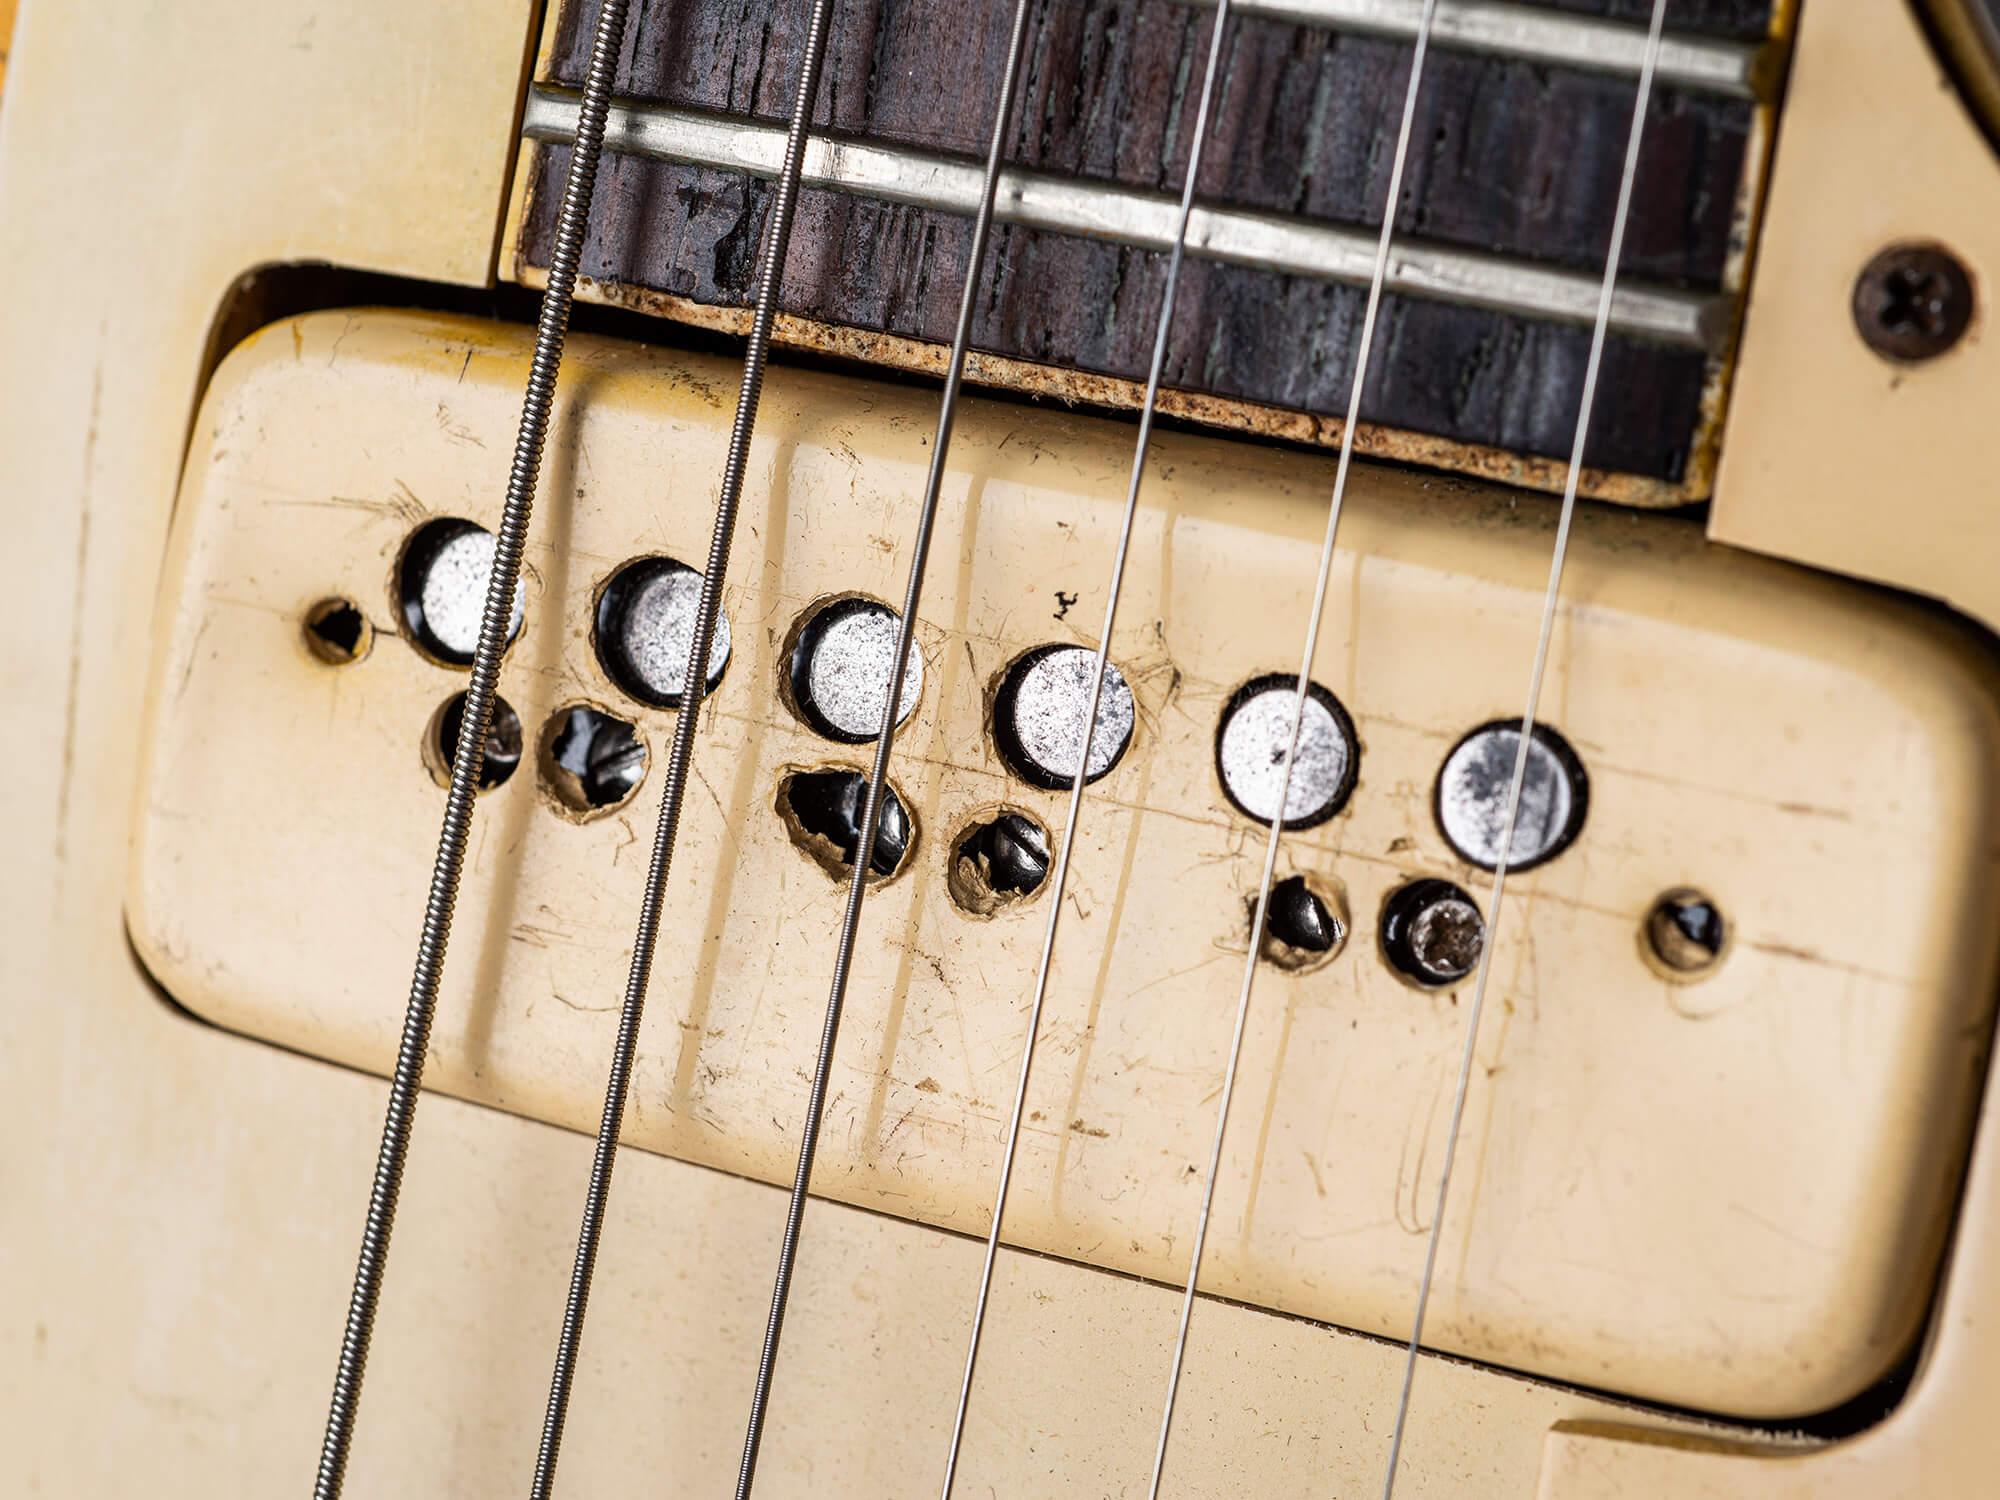 Les Paul's Number One Guitar